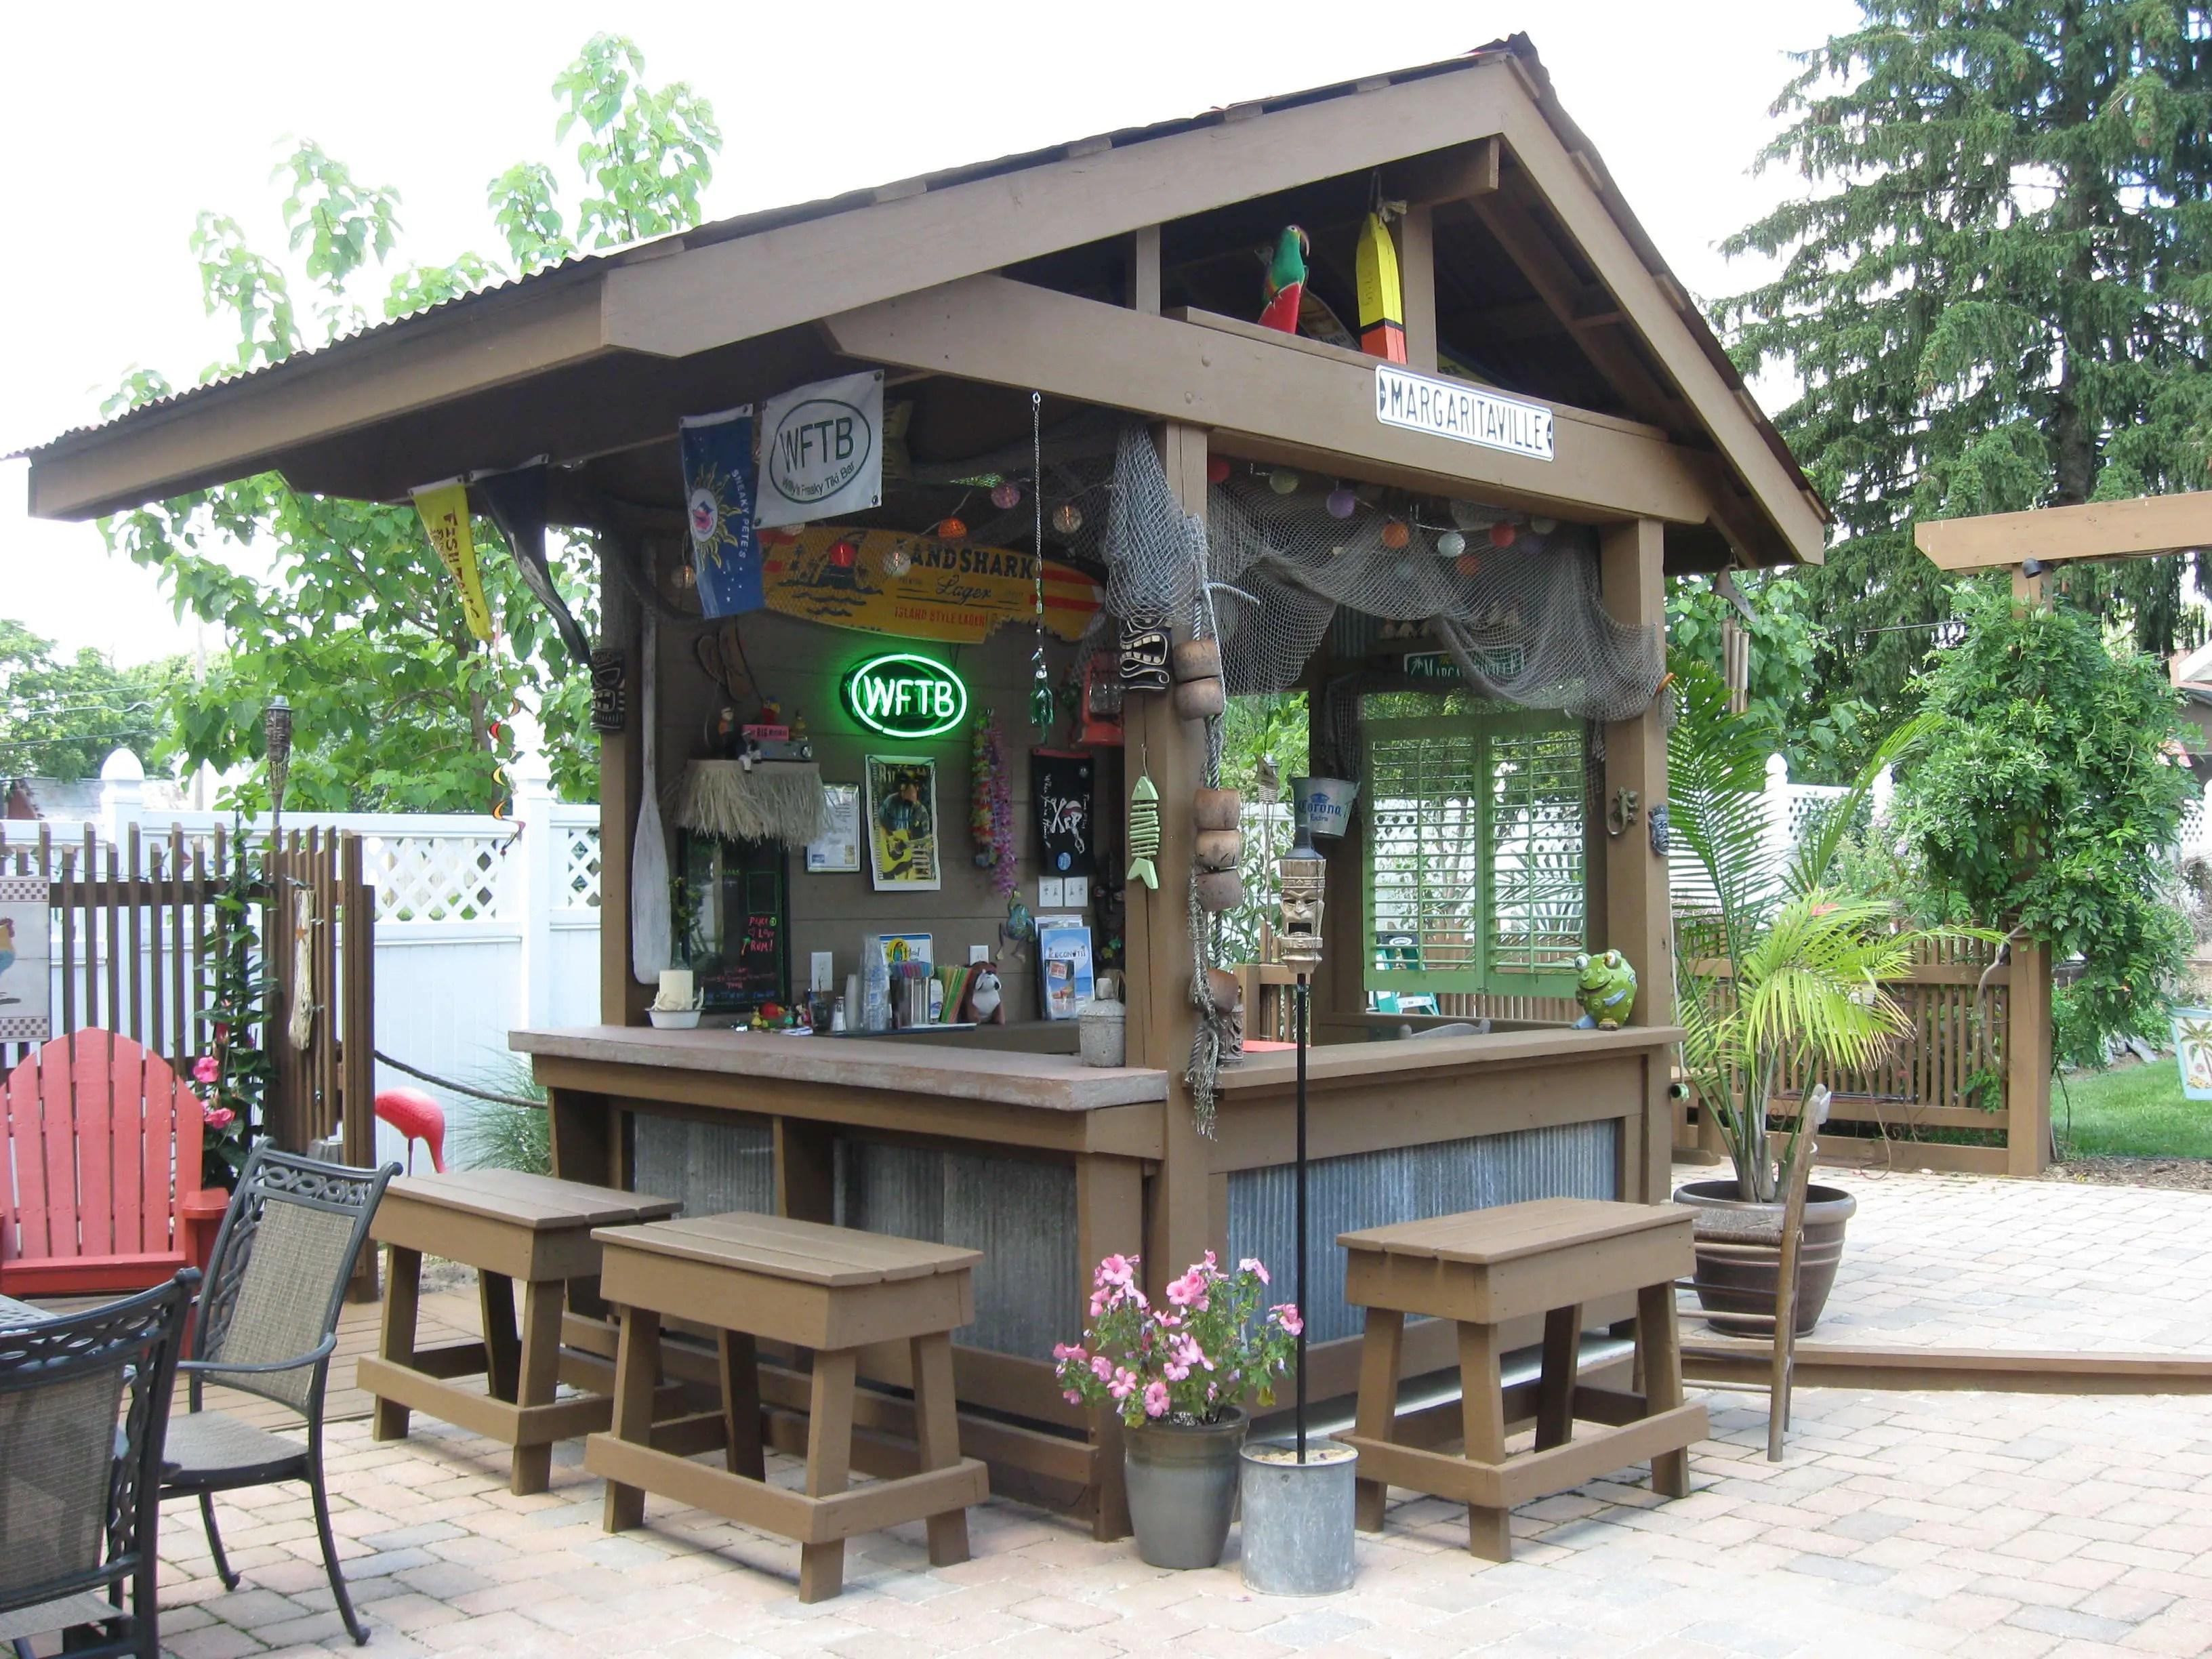 DIY OUTDOOR BAR IDEAS 30 - decoratoo on Backyard Design Ideas Diy id=76243